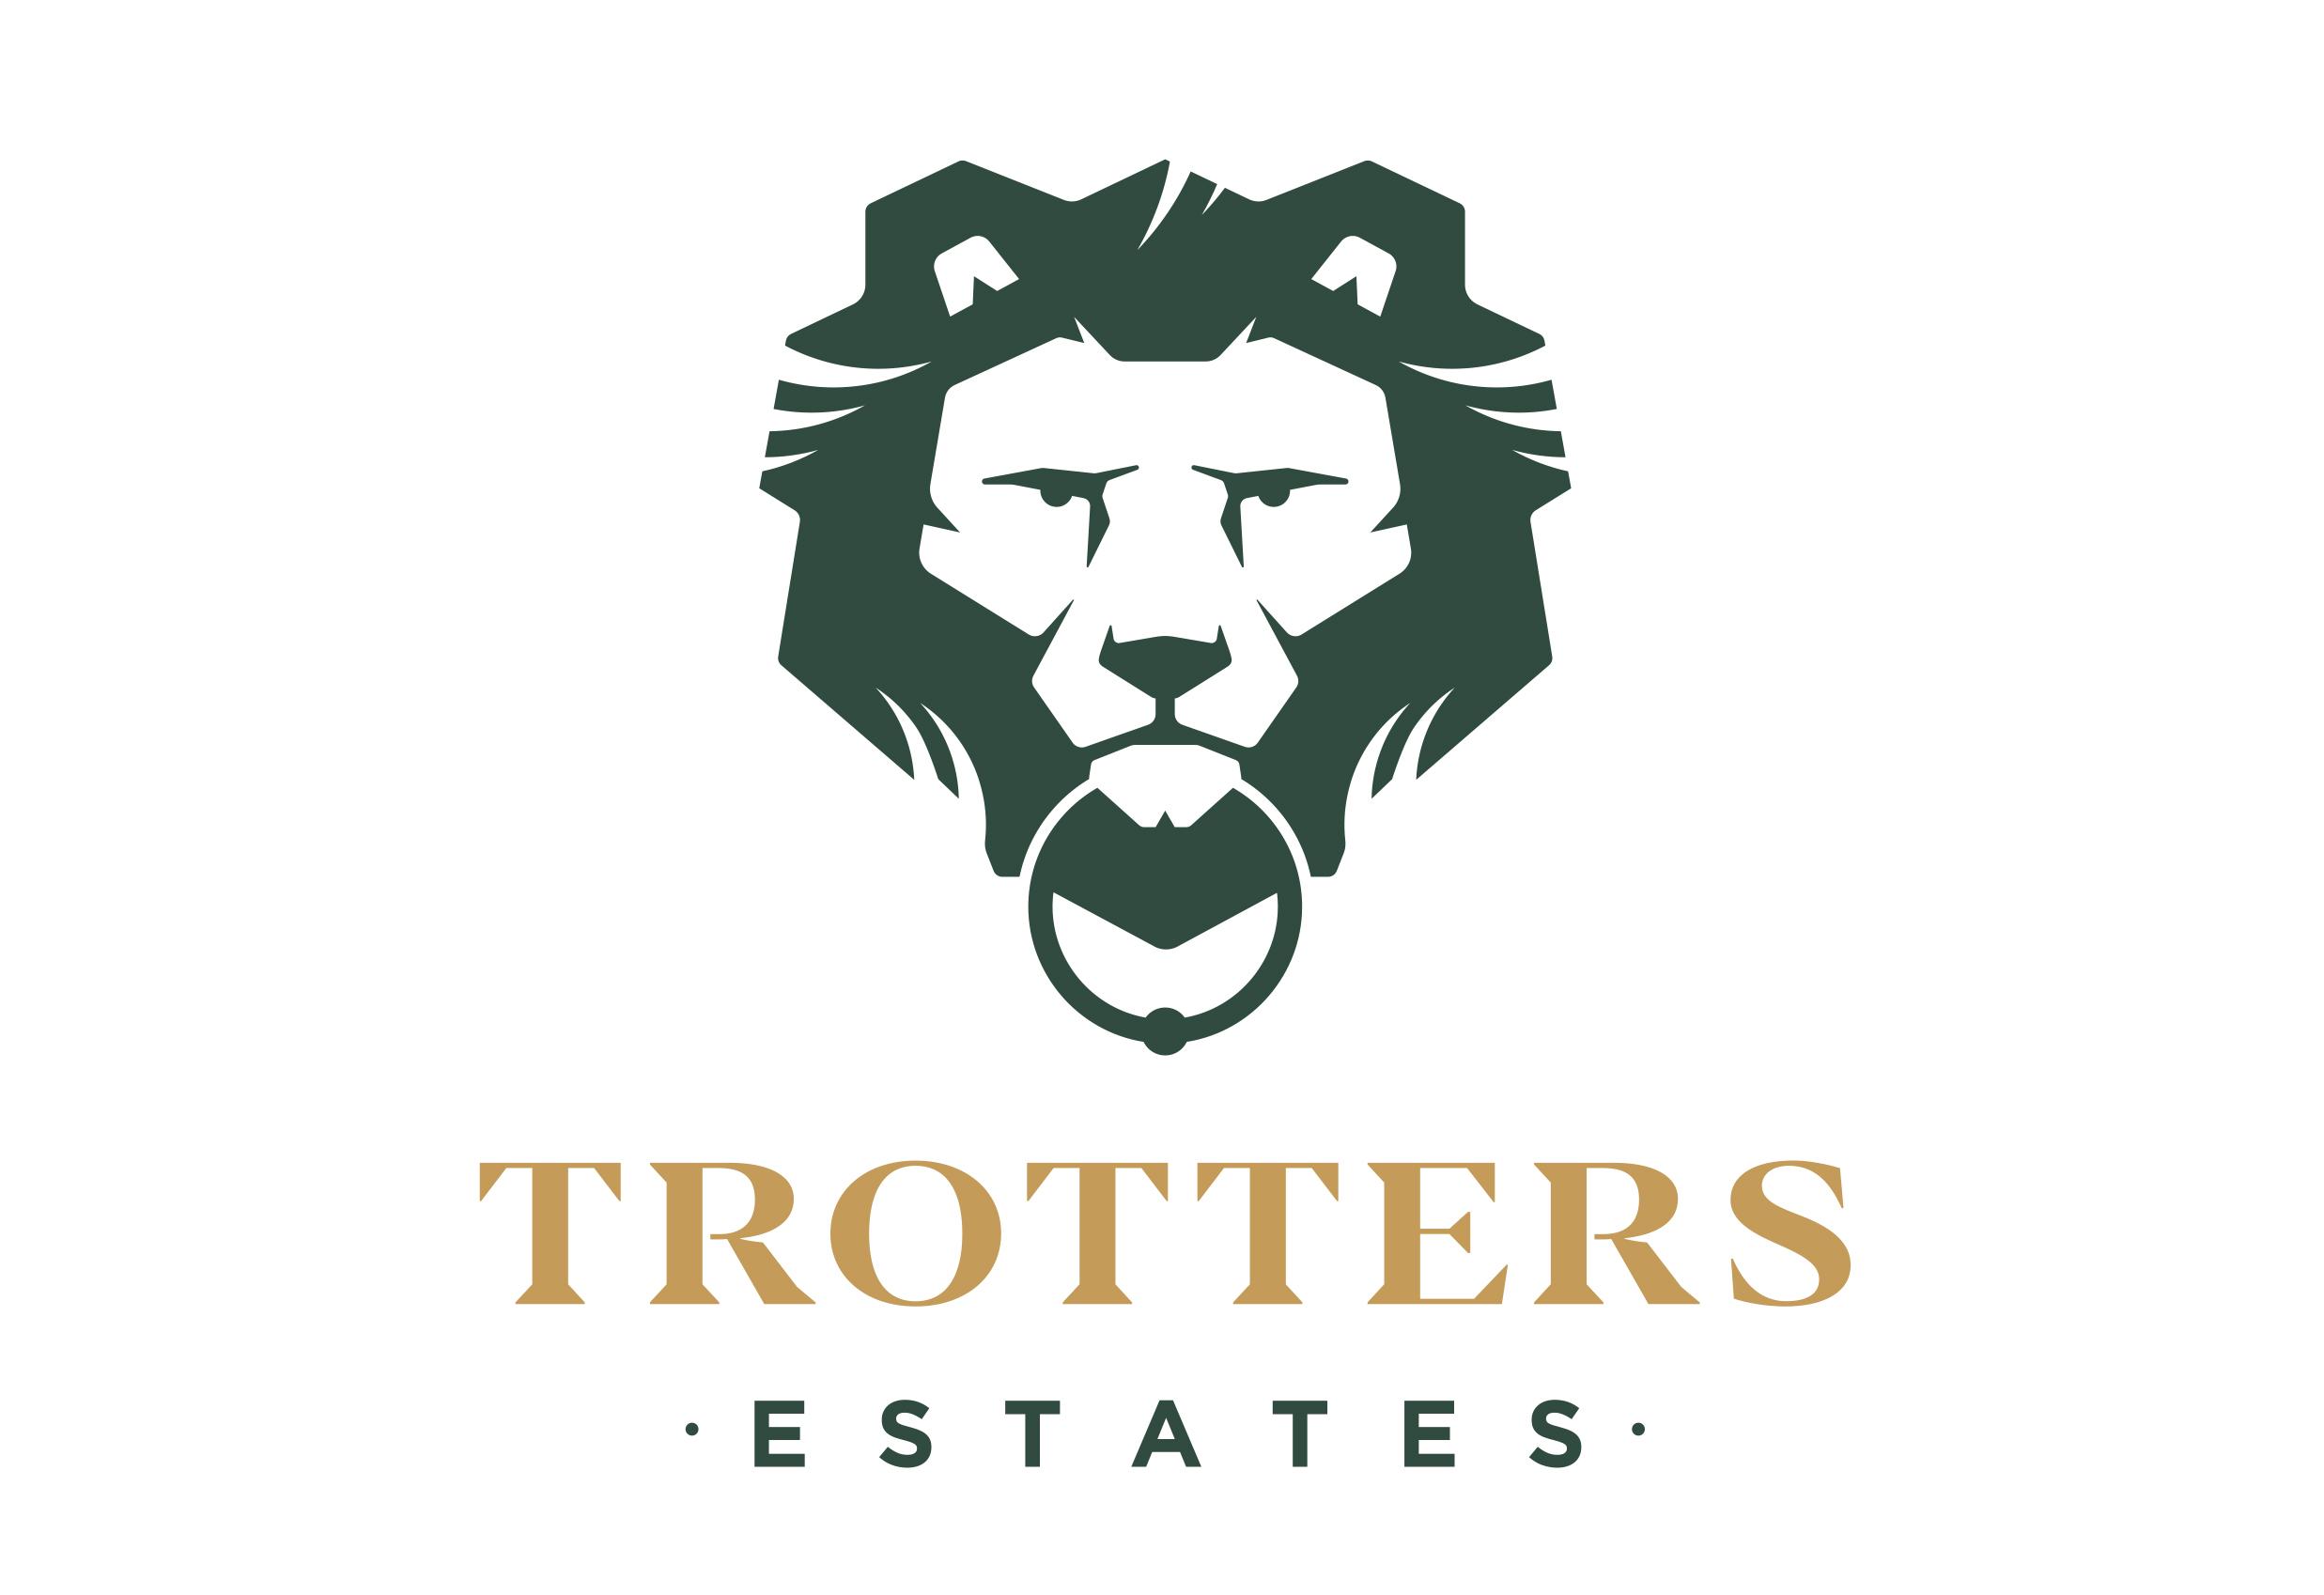 Trotters Estates - London